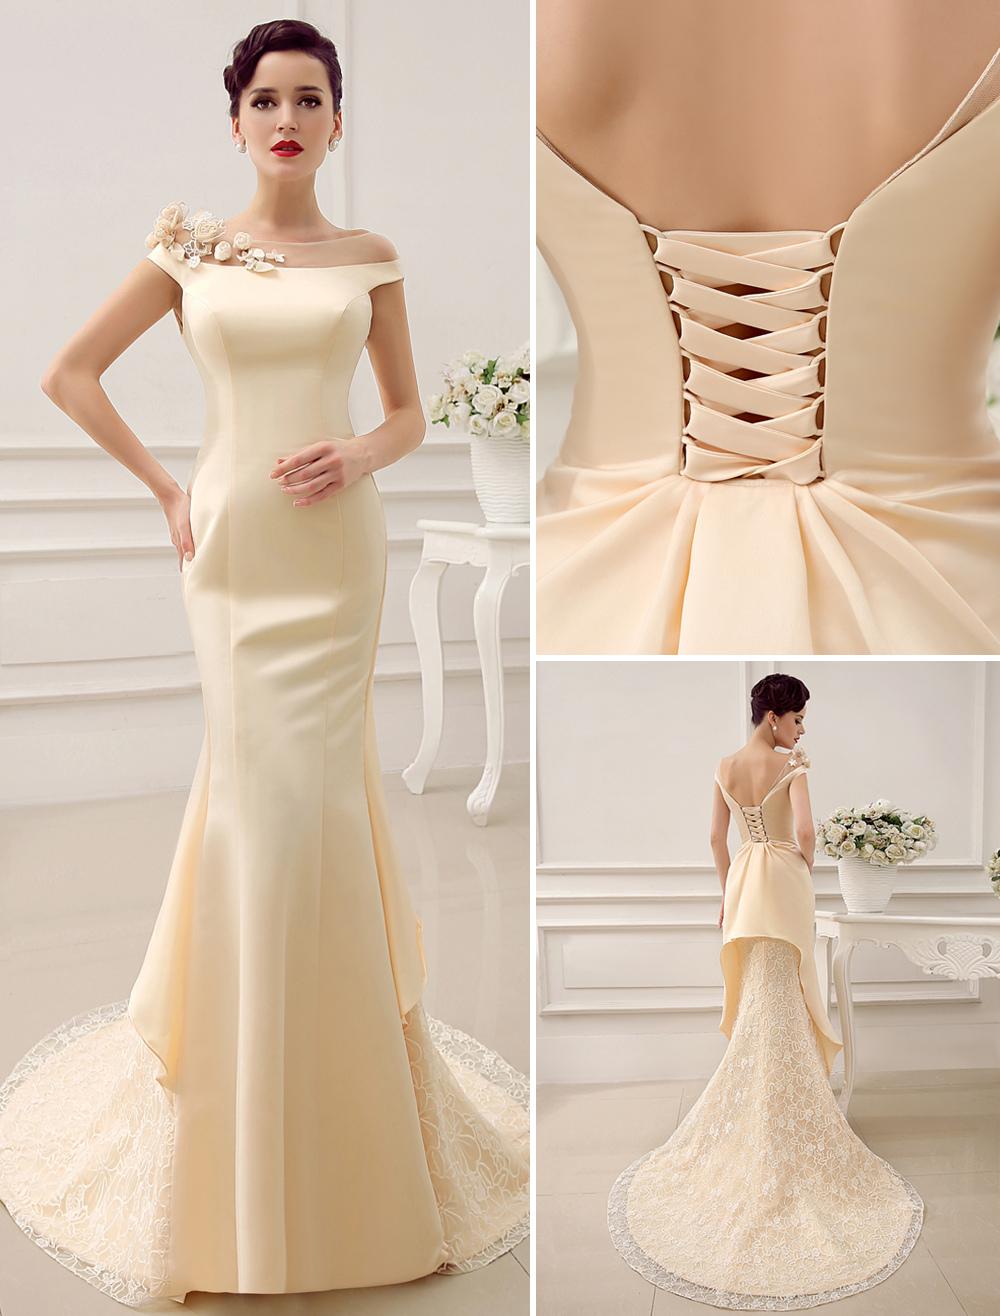 Bateau Neck Shoulder Flower Design Mermaid Court Train Wedding Dress For Bride With Low Back Milanoo